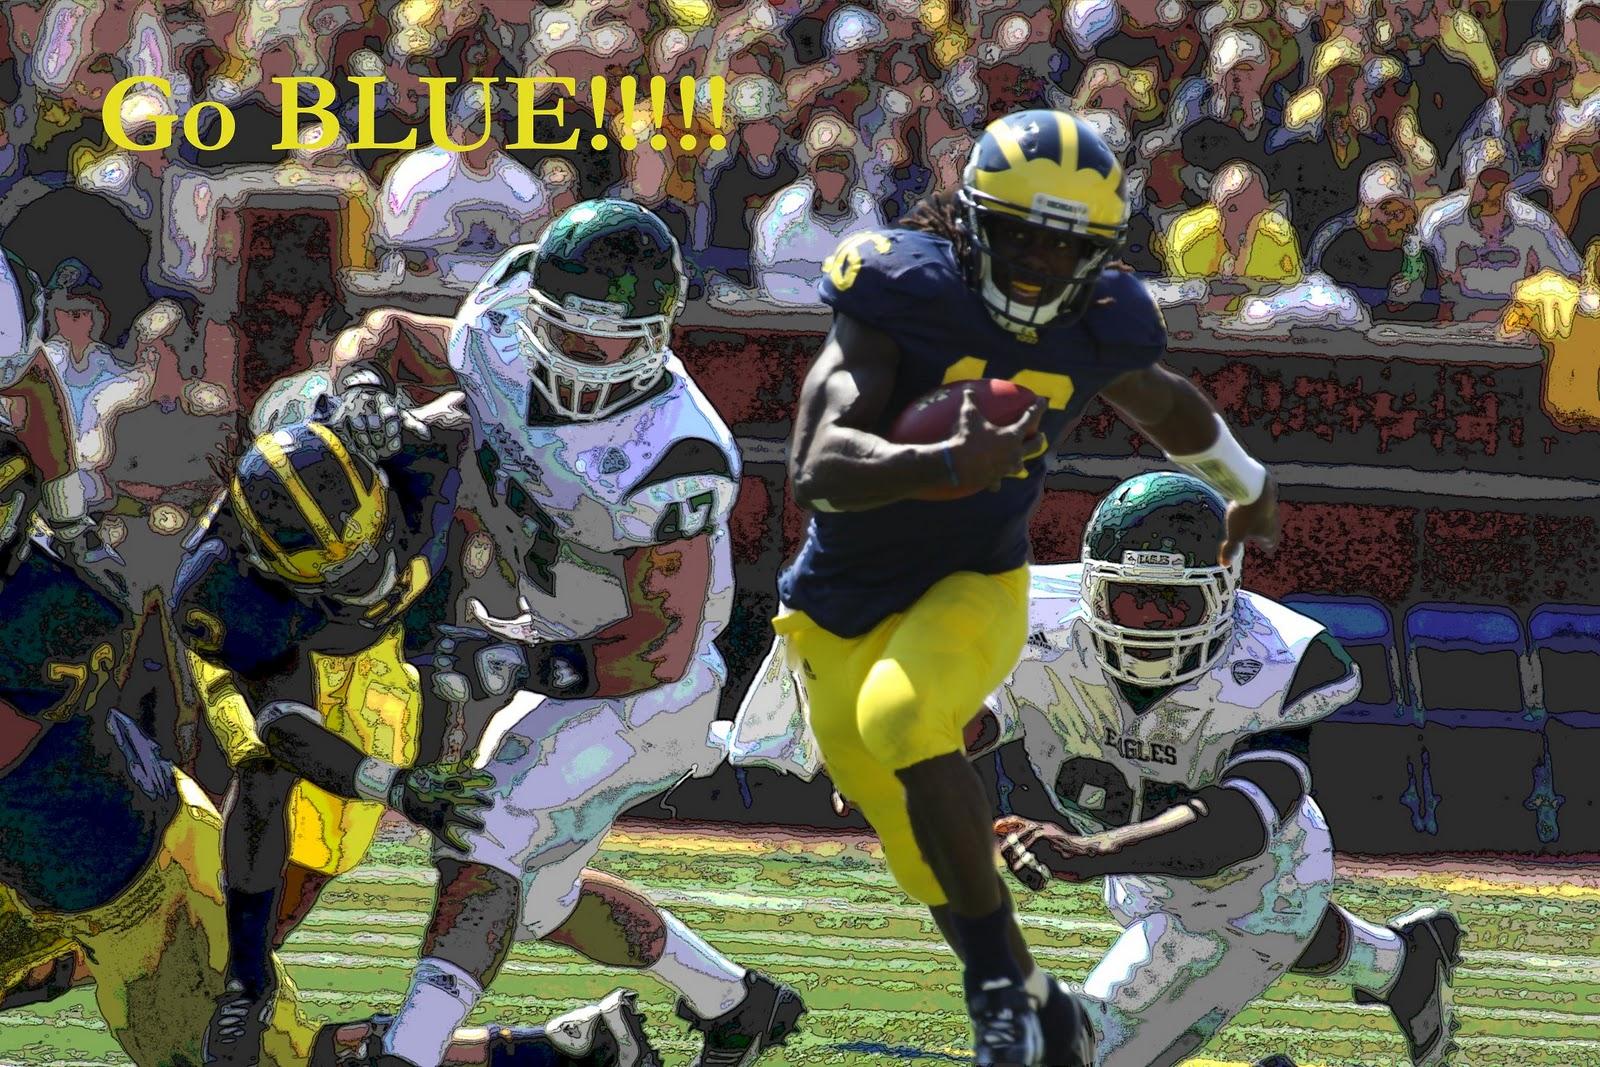 Football Field as Background college football wallpapers desktop 1600x1067